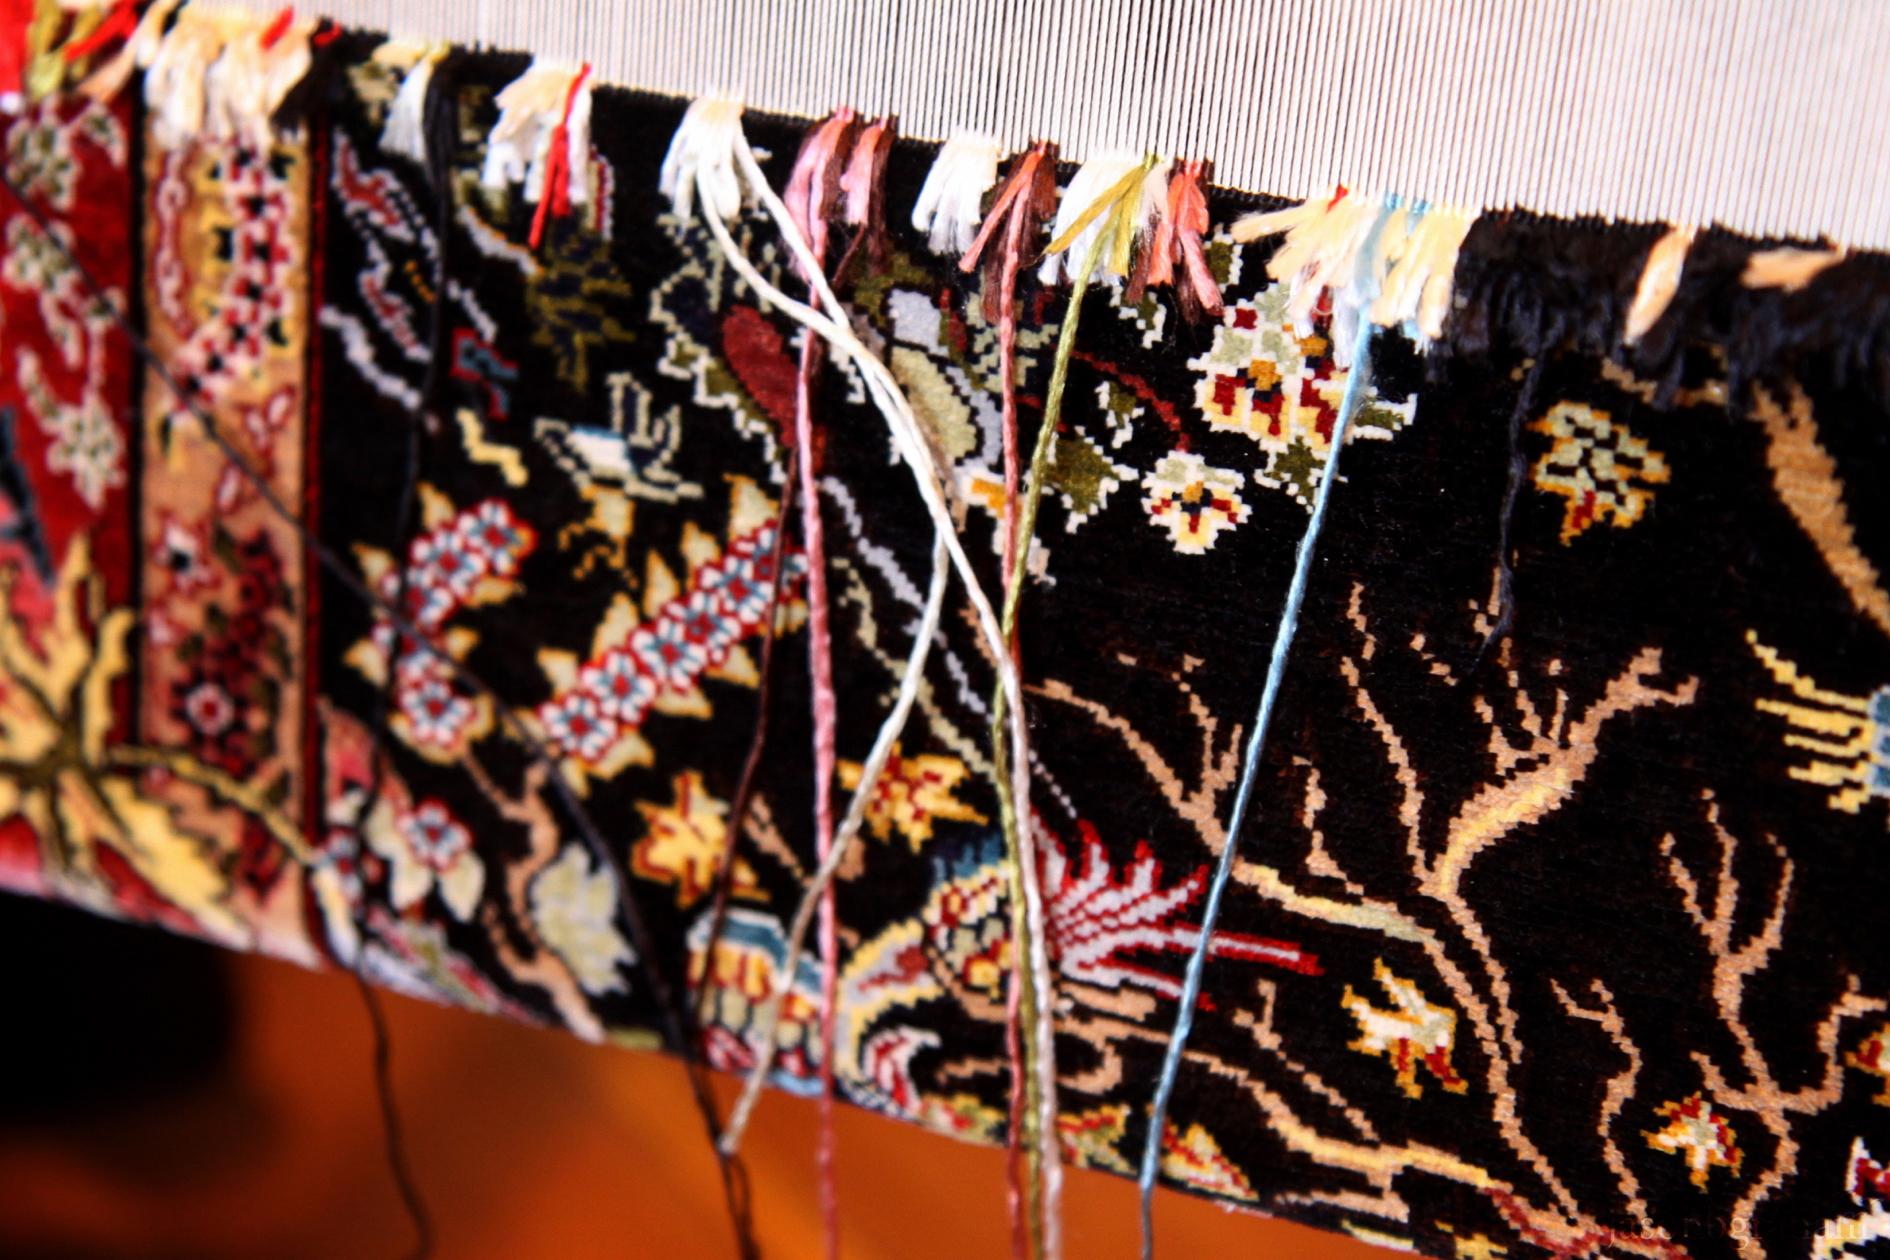 carpet-weaving-8344